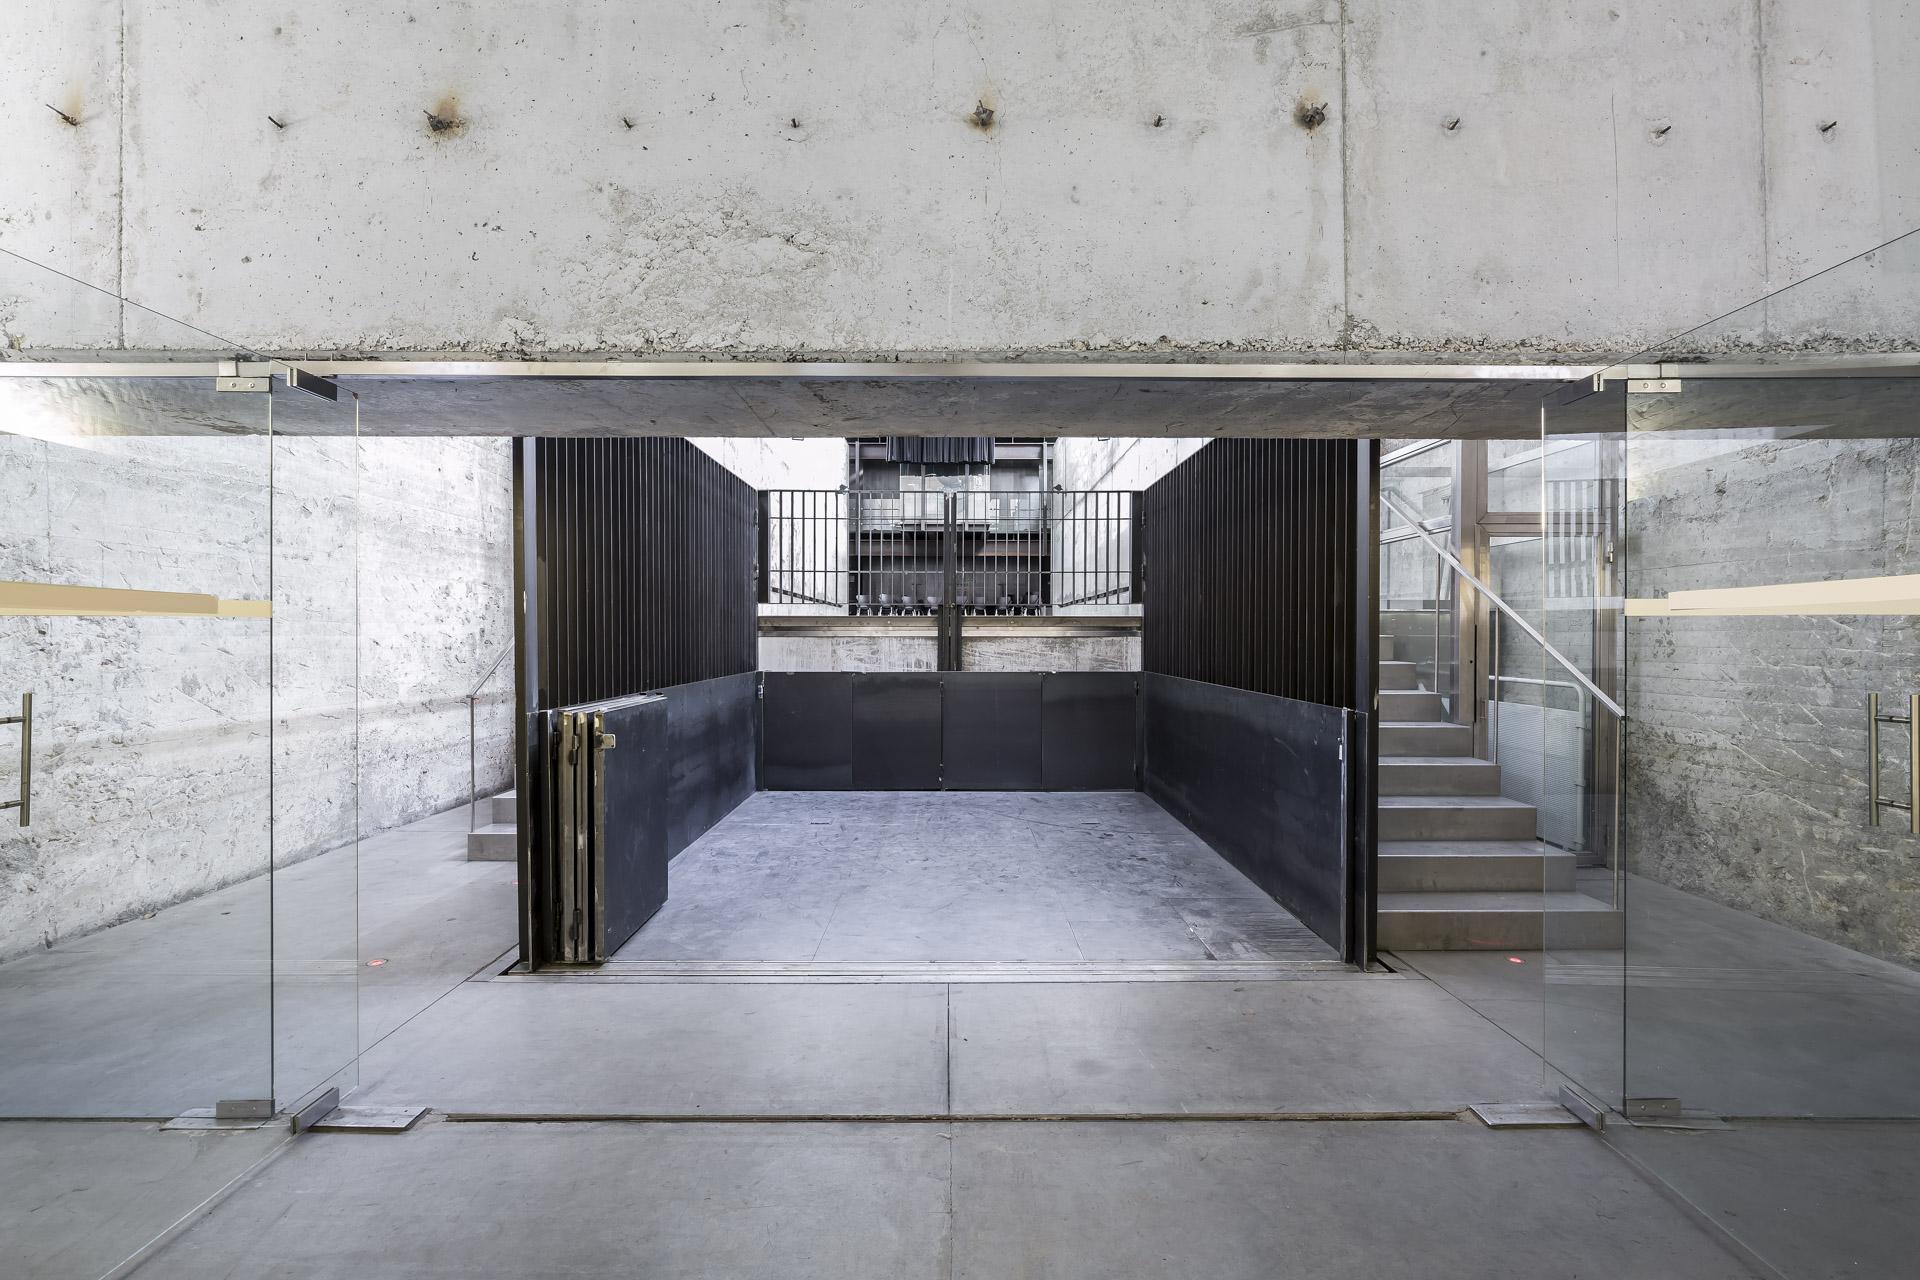 fotografia-arquitectura-madrid-nuevos-ministerios-elorza-german-cabo-15